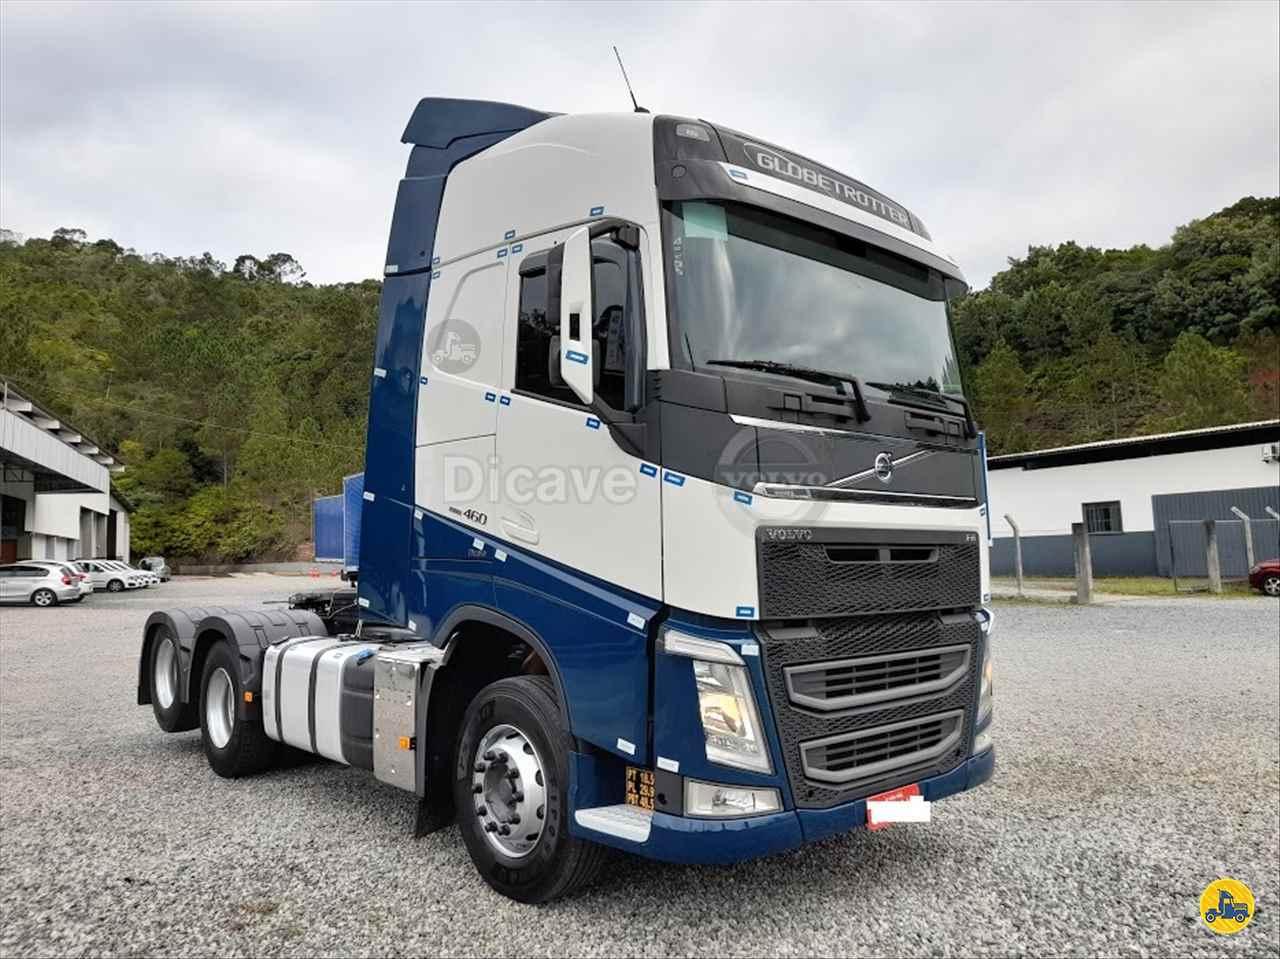 CAMINHAO VOLVO VOLVO FH 460 Cavalo Mecânico Truck 6x2 Dicave Viking Center - Volvo ITAJAI SANTA CATARINA SC